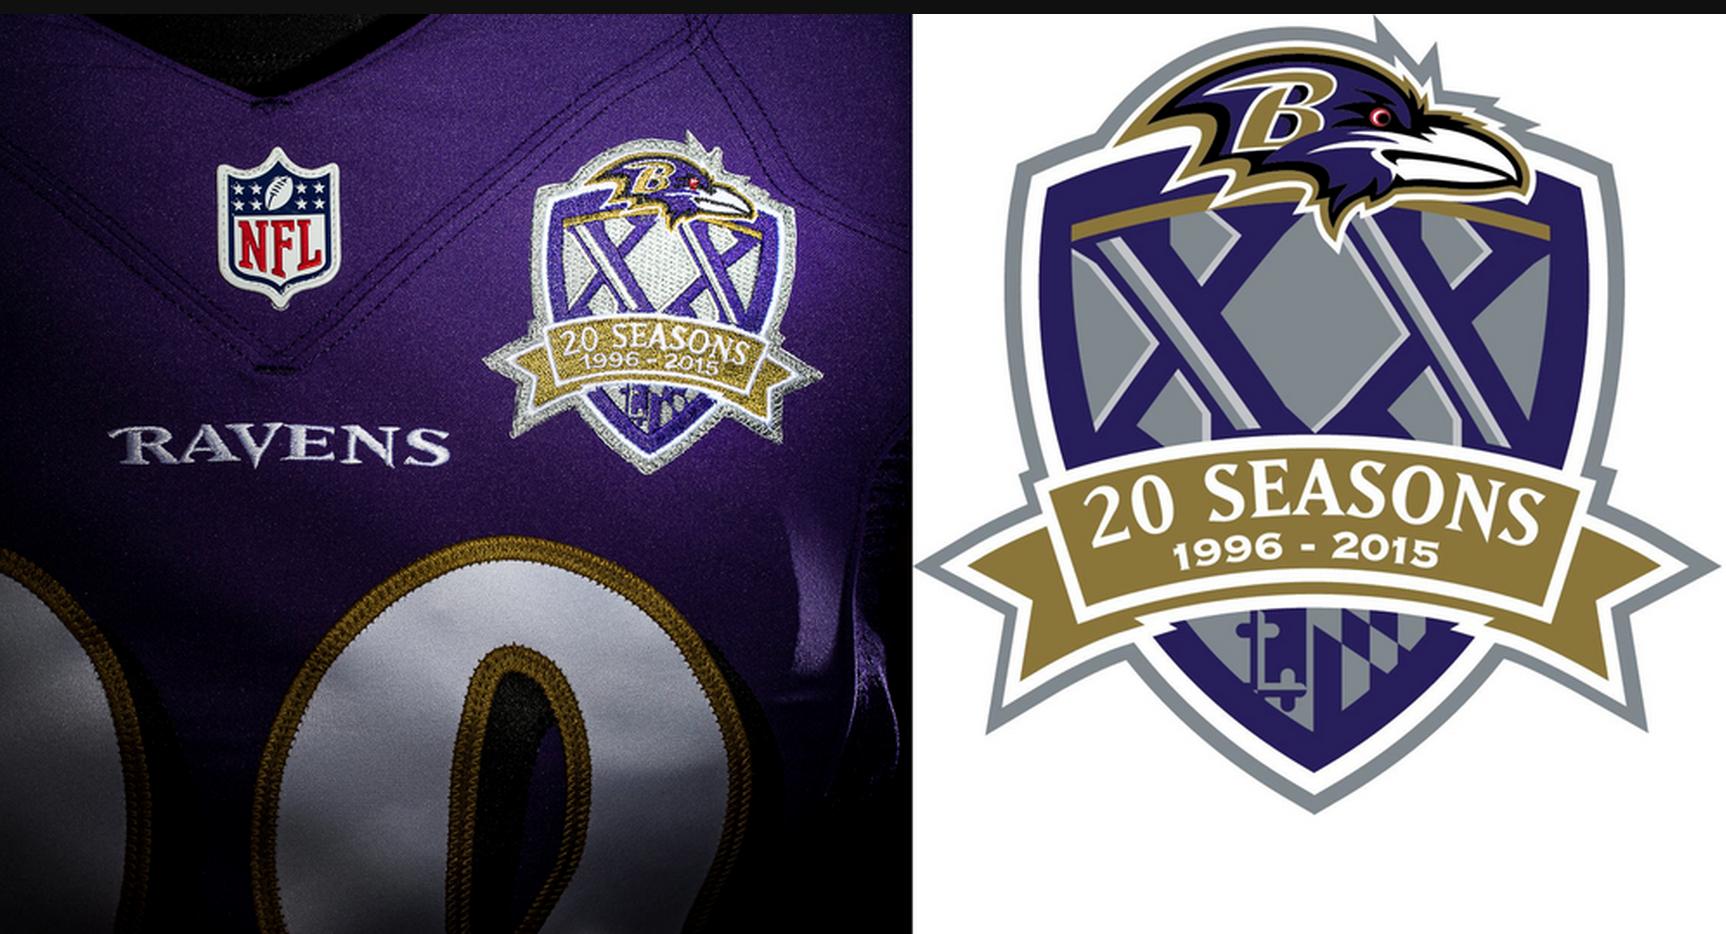 Ravens 20th Anniversary